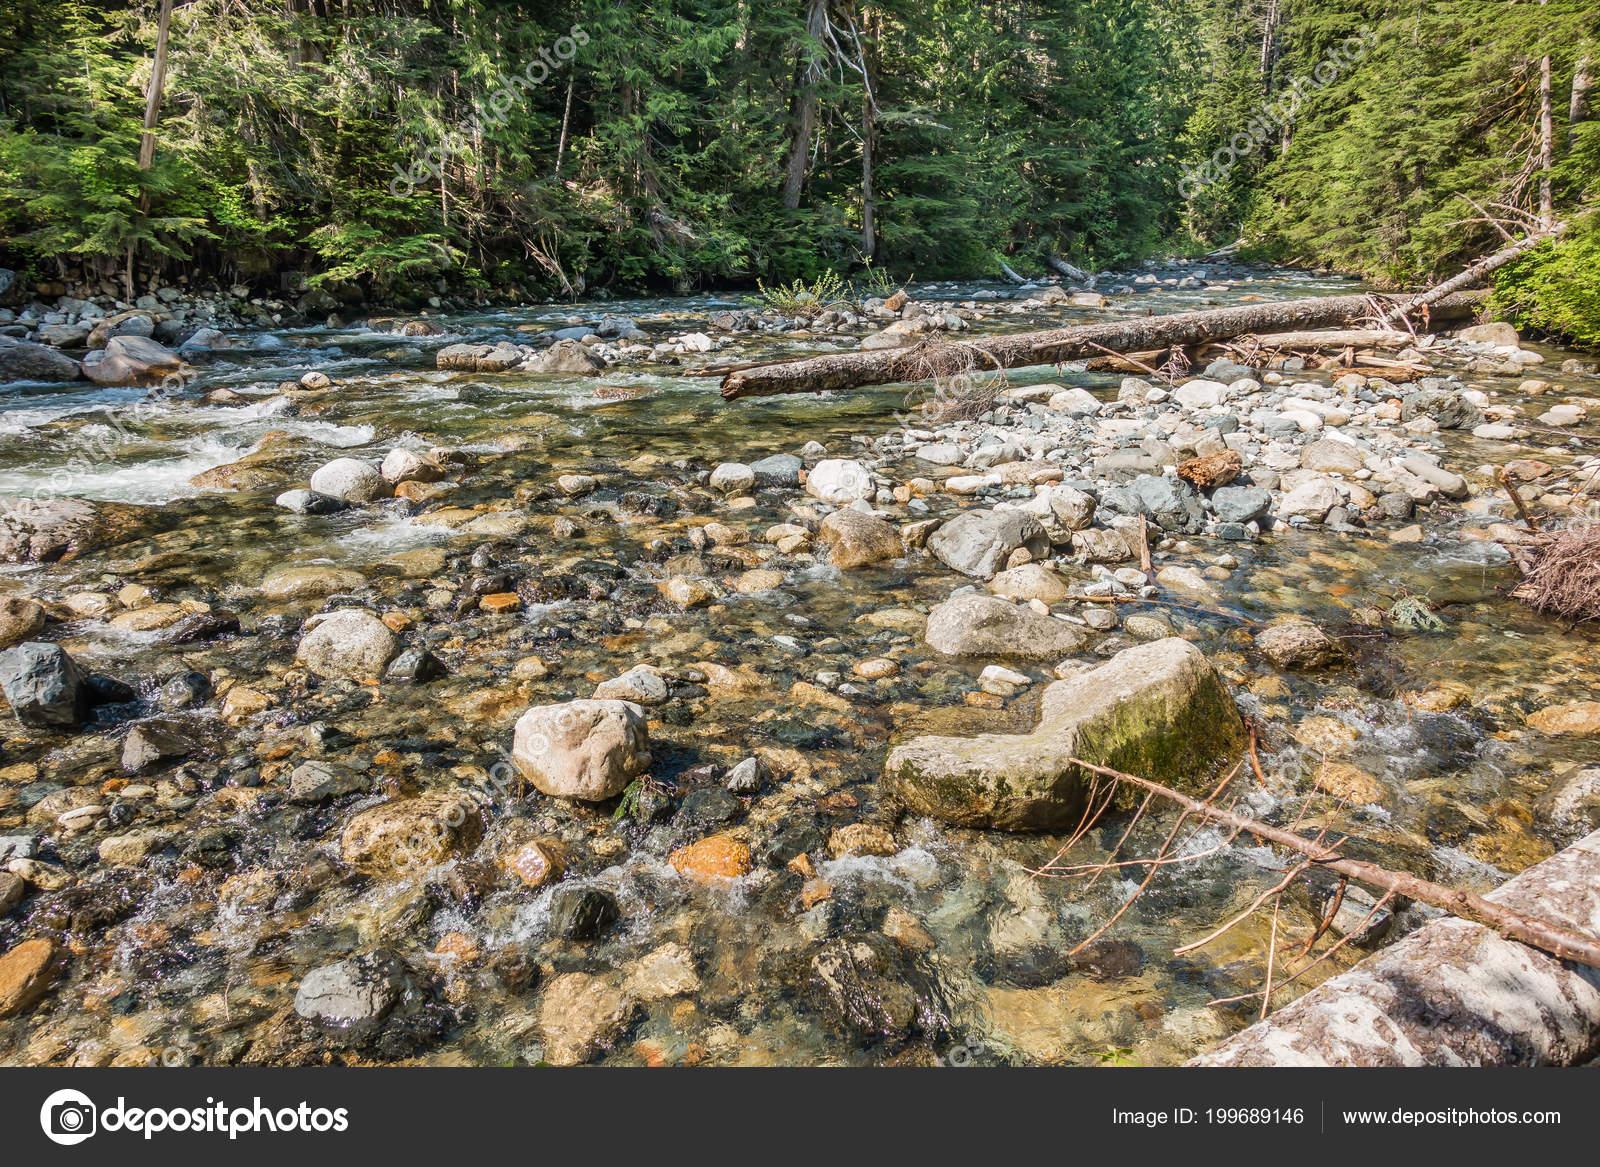 Landscape Shot Denny Creek Washington State Rocks Logs Can